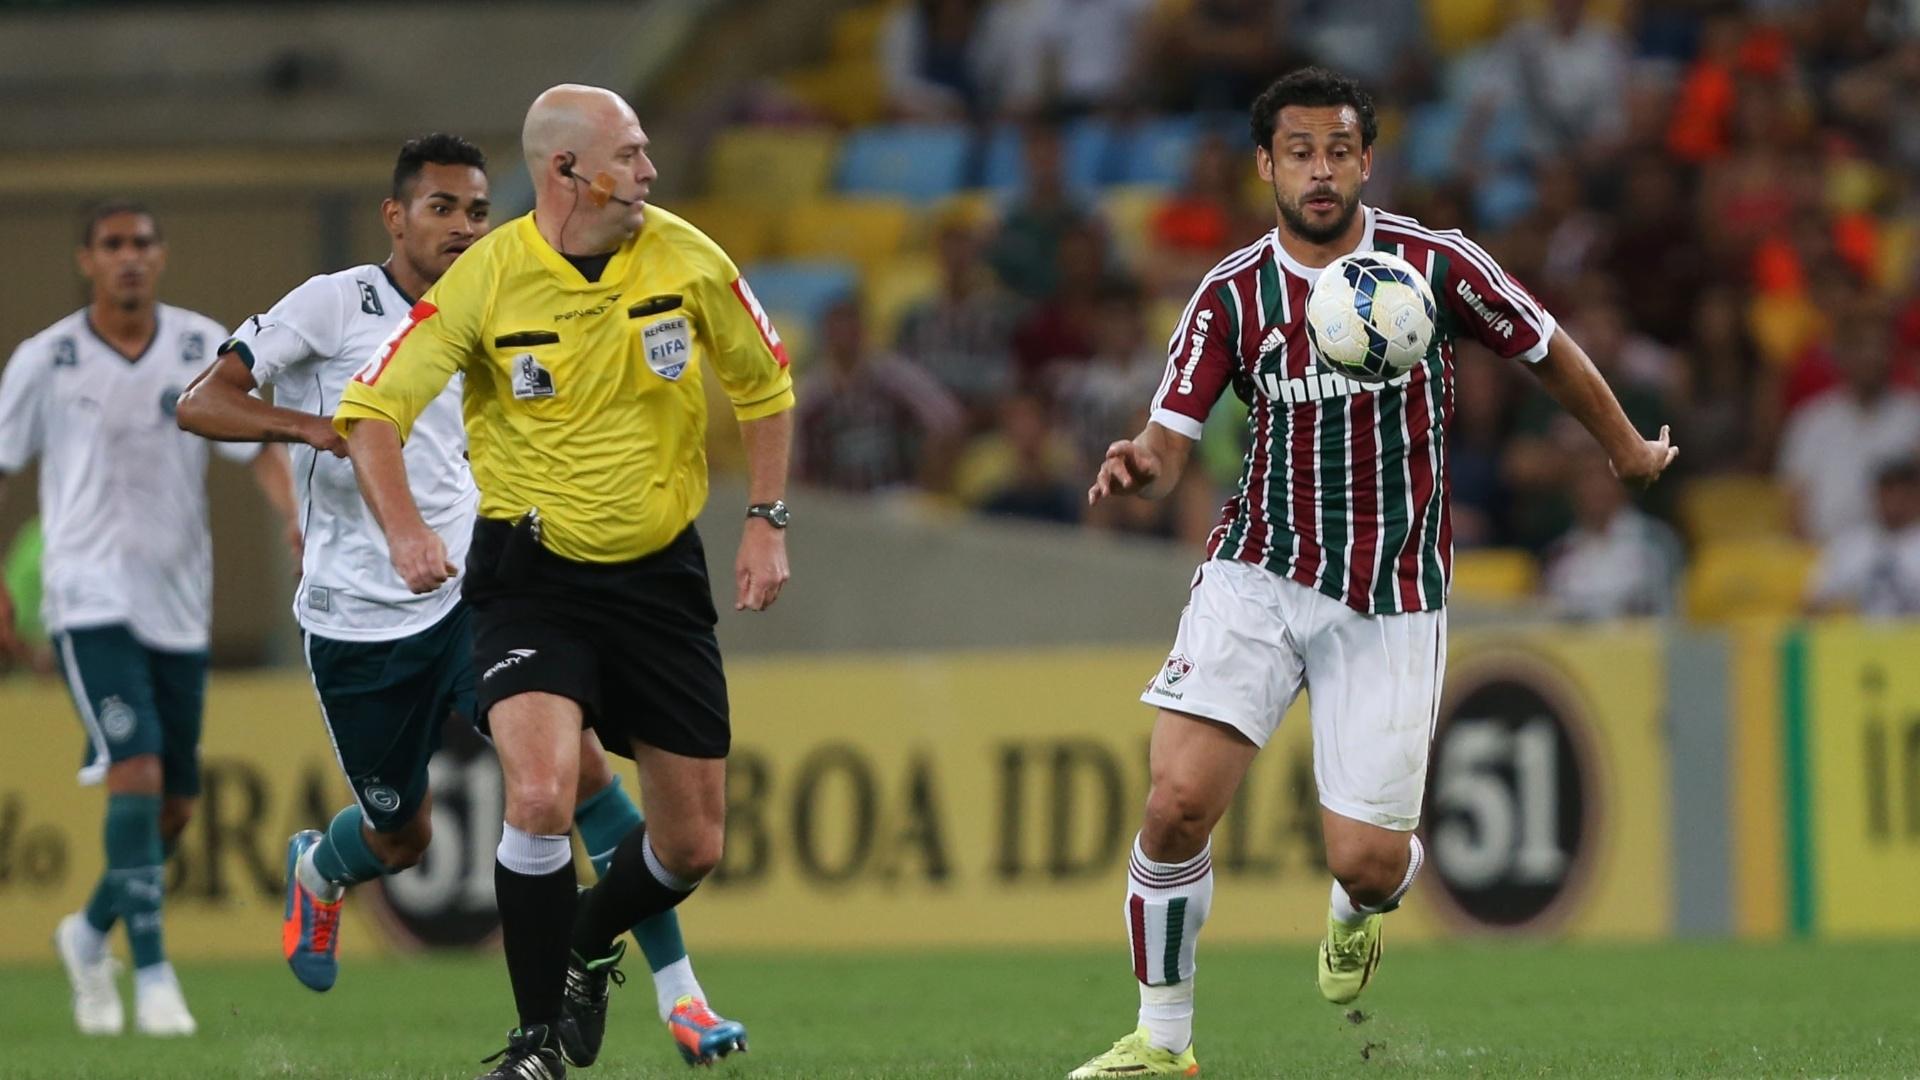 Fred mata a bola e tenta comandar ataque do Fluminense em partida contra o Goiás, pela 13ª rodada do Brasileiro